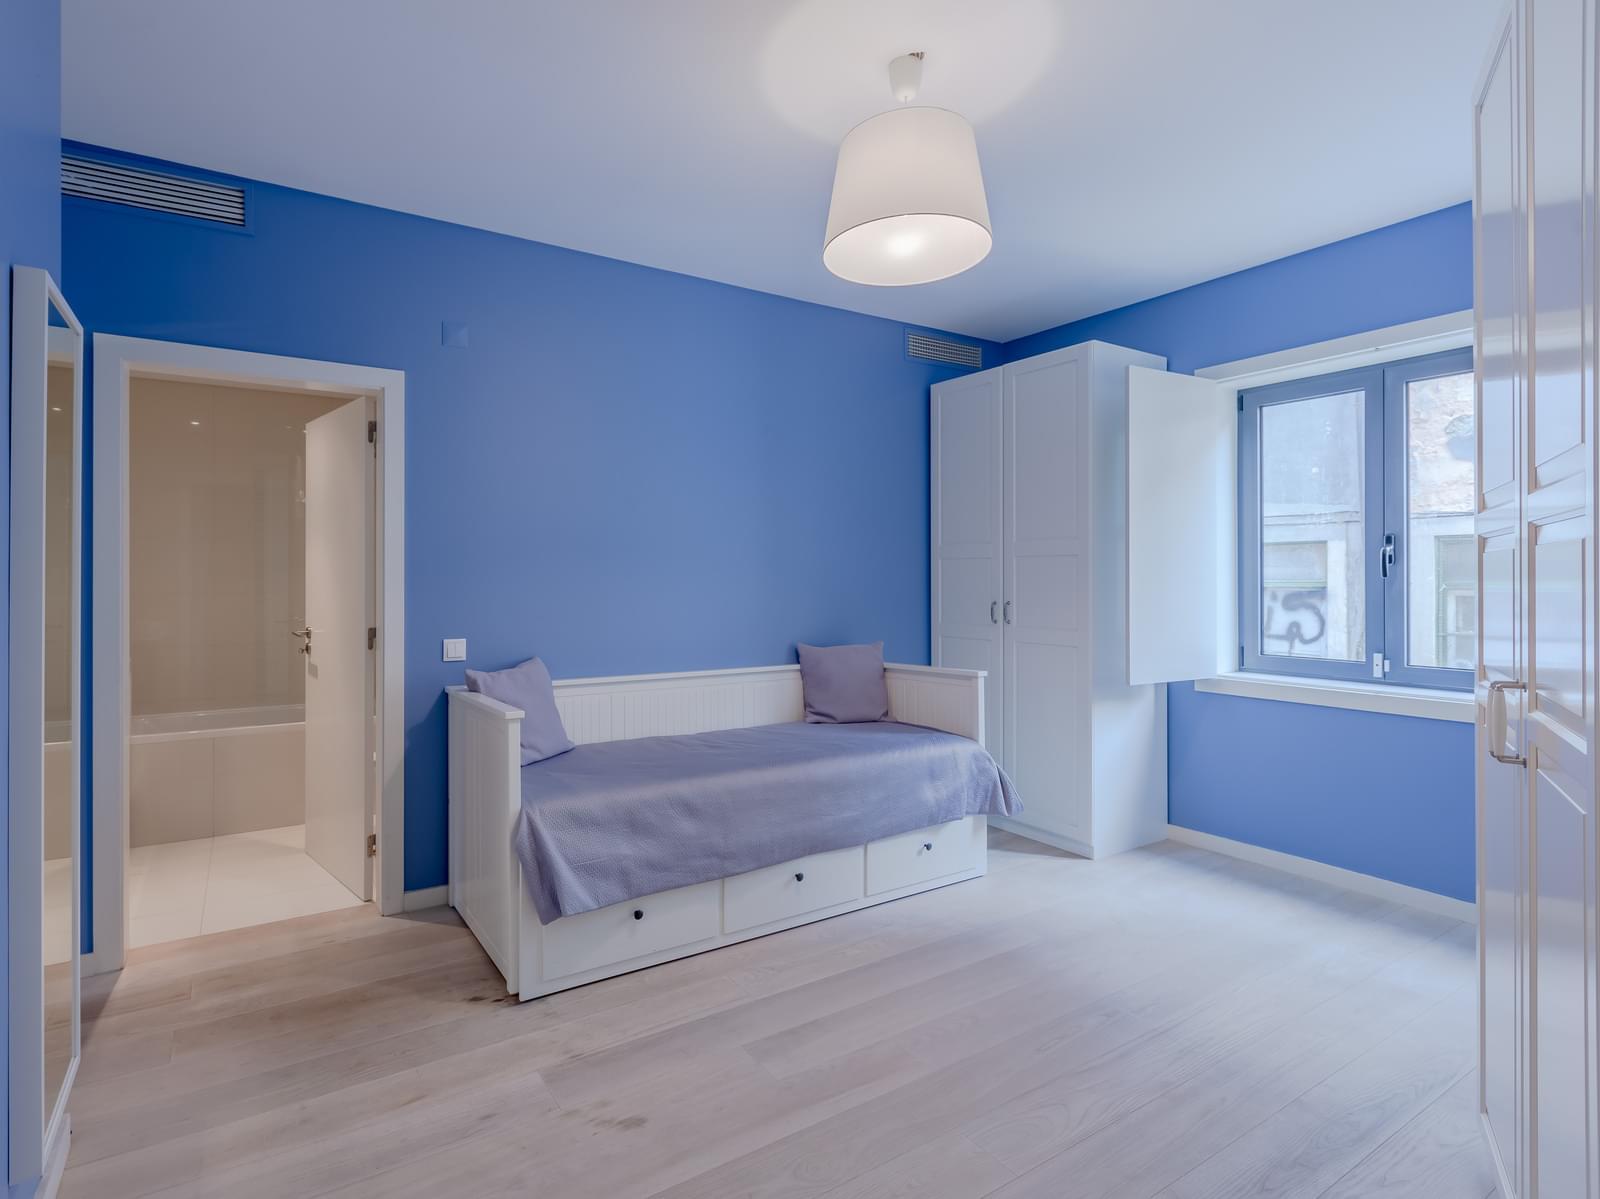 pf18160-apartamento-t2-lisboa-b4d024f3-7c1f-4ce1-bfe1-b43a5f1d9ae4